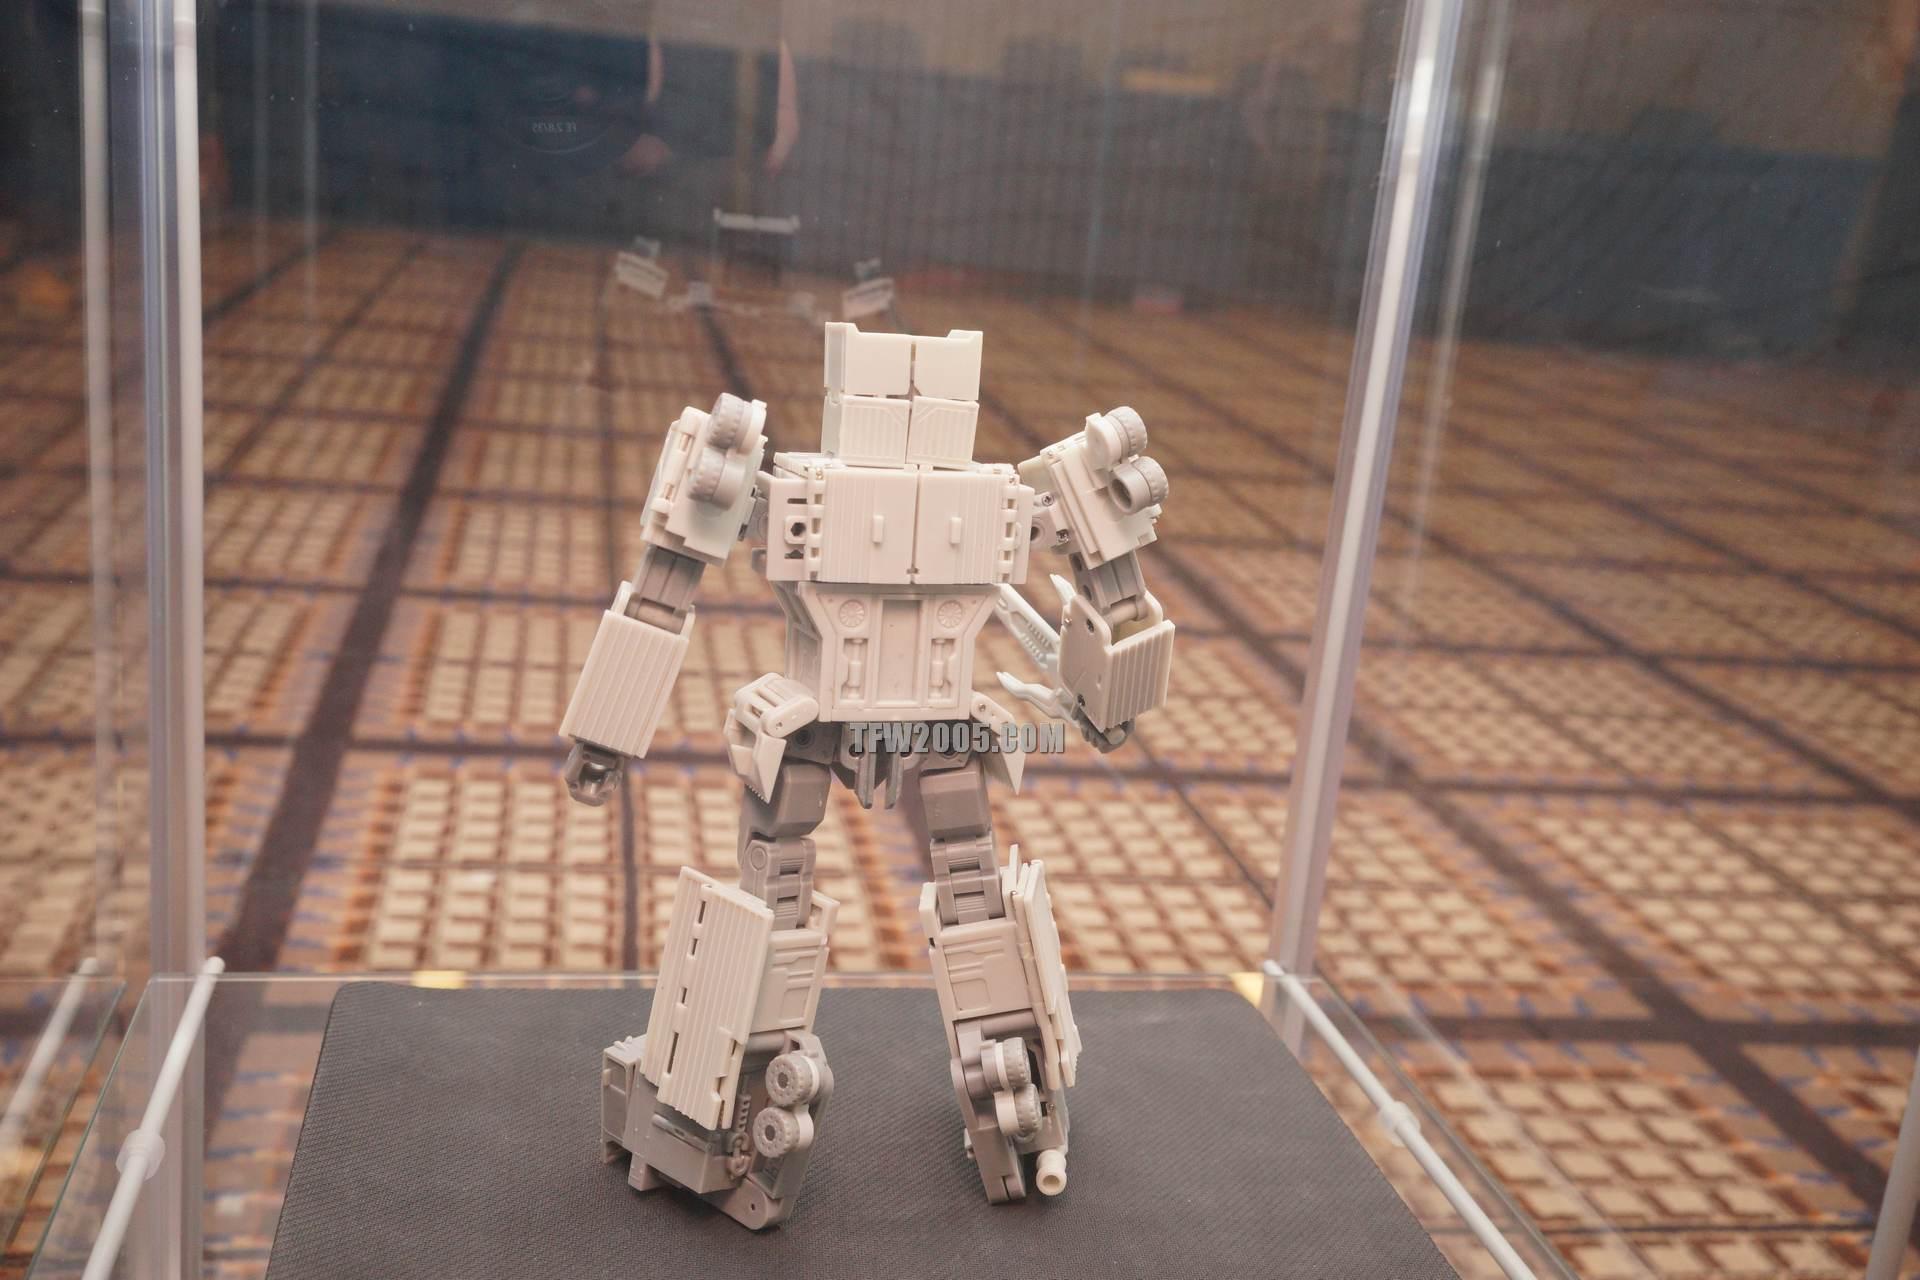 [Bold Forms] Produit Tiers - BF-01 Gladius (aka Mégatron G1) + Lone Wolf (aka Menasor/Menaseur G1) DSC08537_1414278766